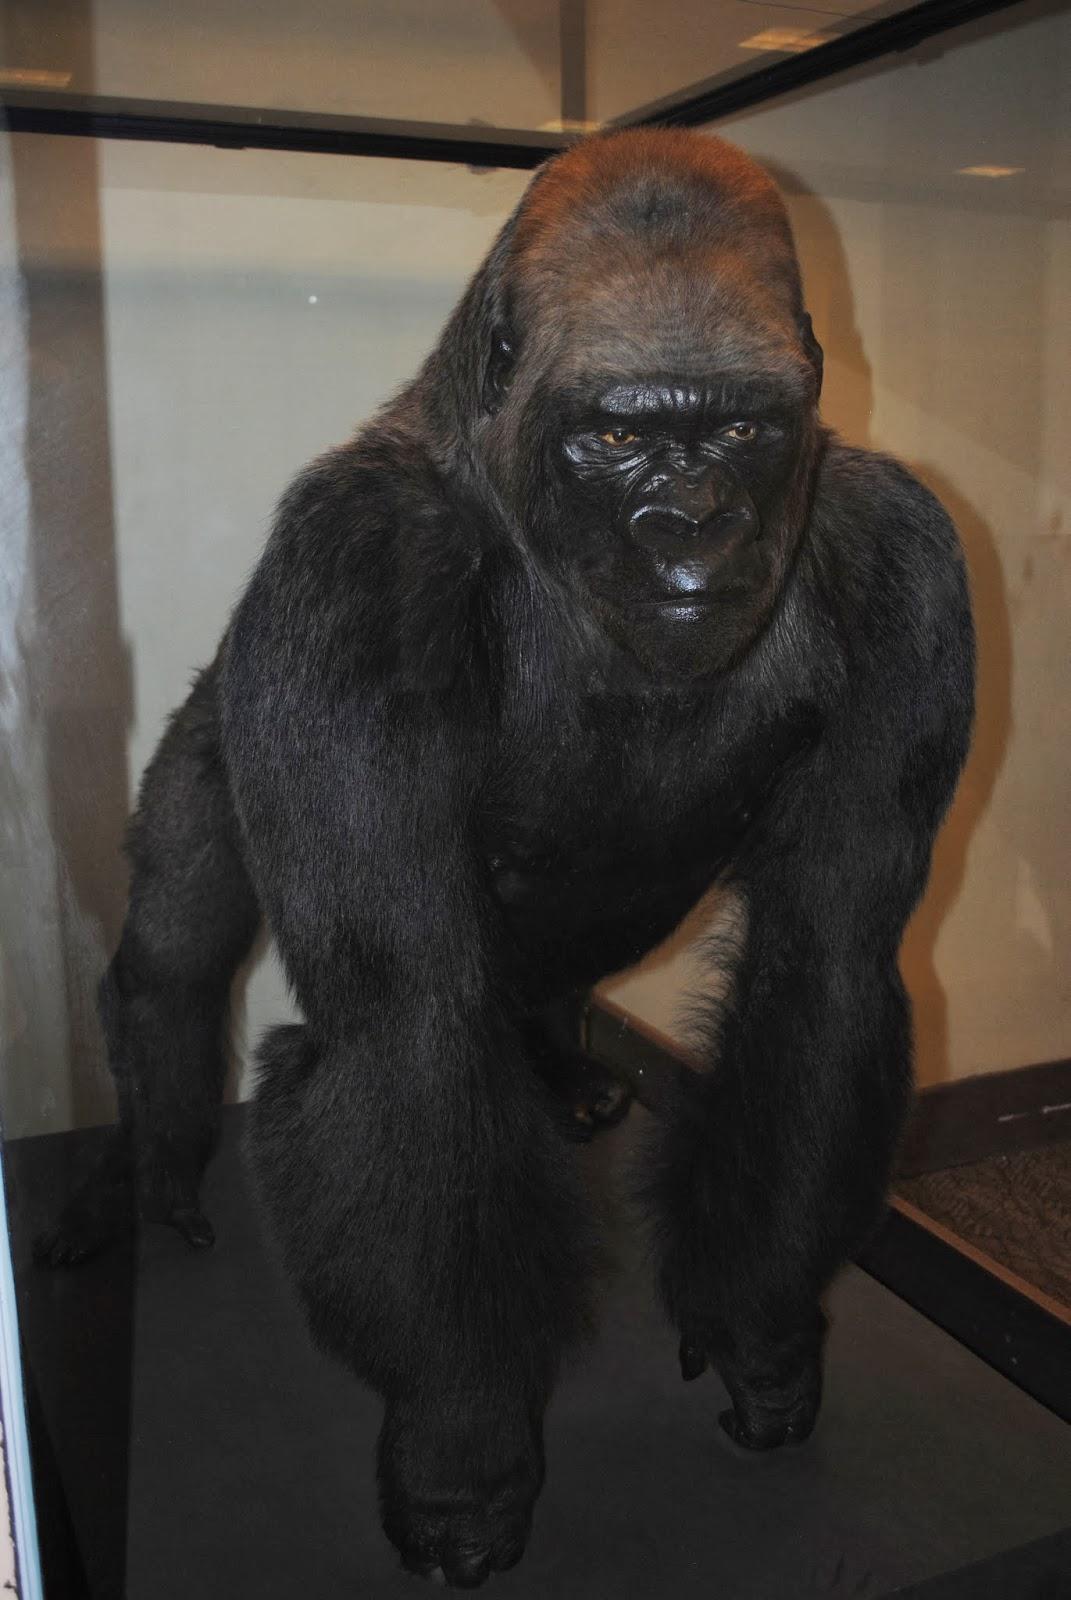 Winifred Smith, 92-Year-Old Cincinnati Woman, 'Reunites ...  |Bushman Gorilla Death